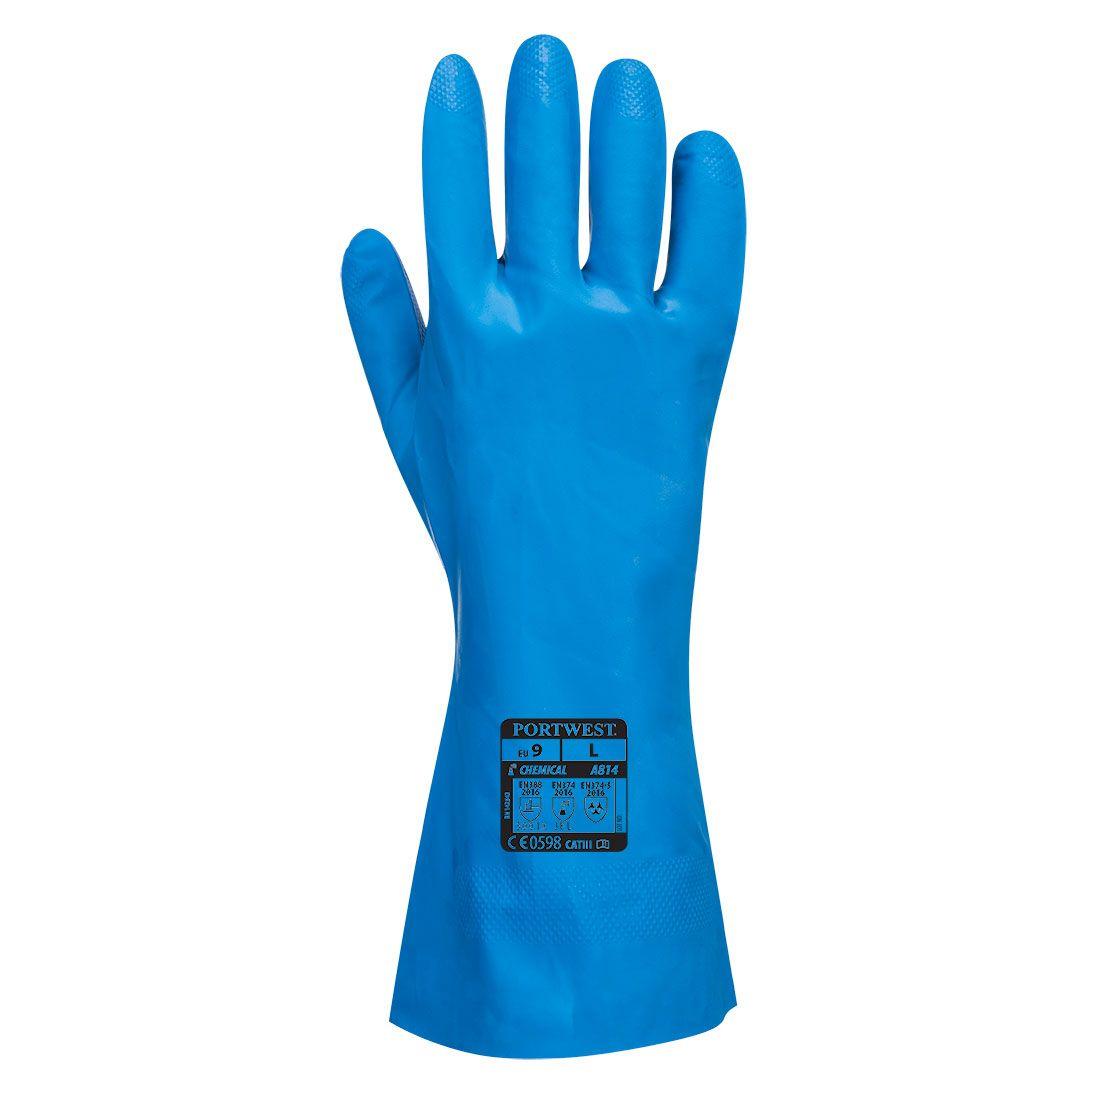 Portwest Handschoenen A814 Voedselindustrie blauw(BL)